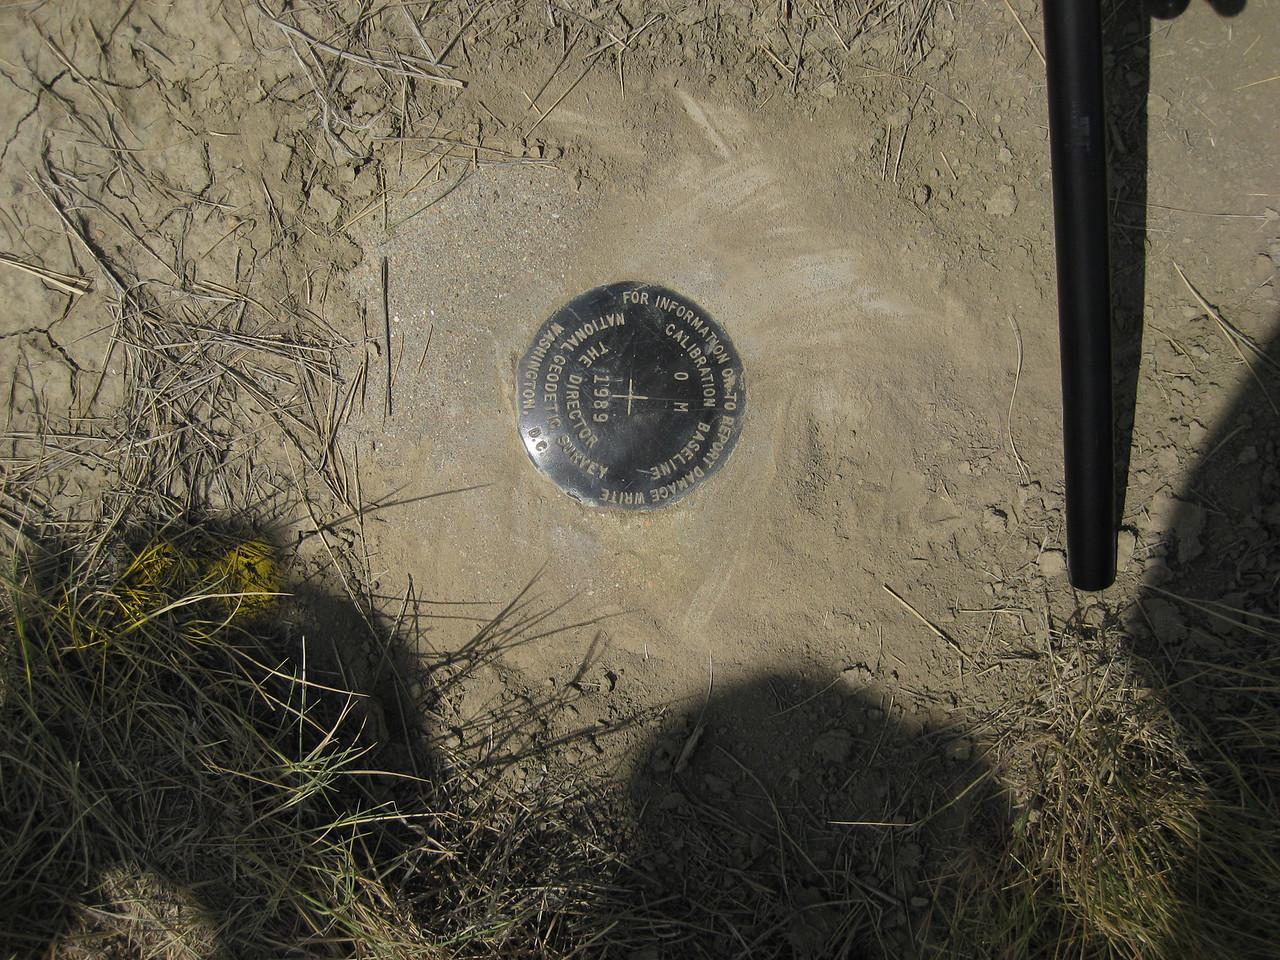 GPS Field Campaign, Rio Grande Rift Project, Eastern Colorado, July 2008<br /> <br /> Limon Airport 39.2684, -103.664